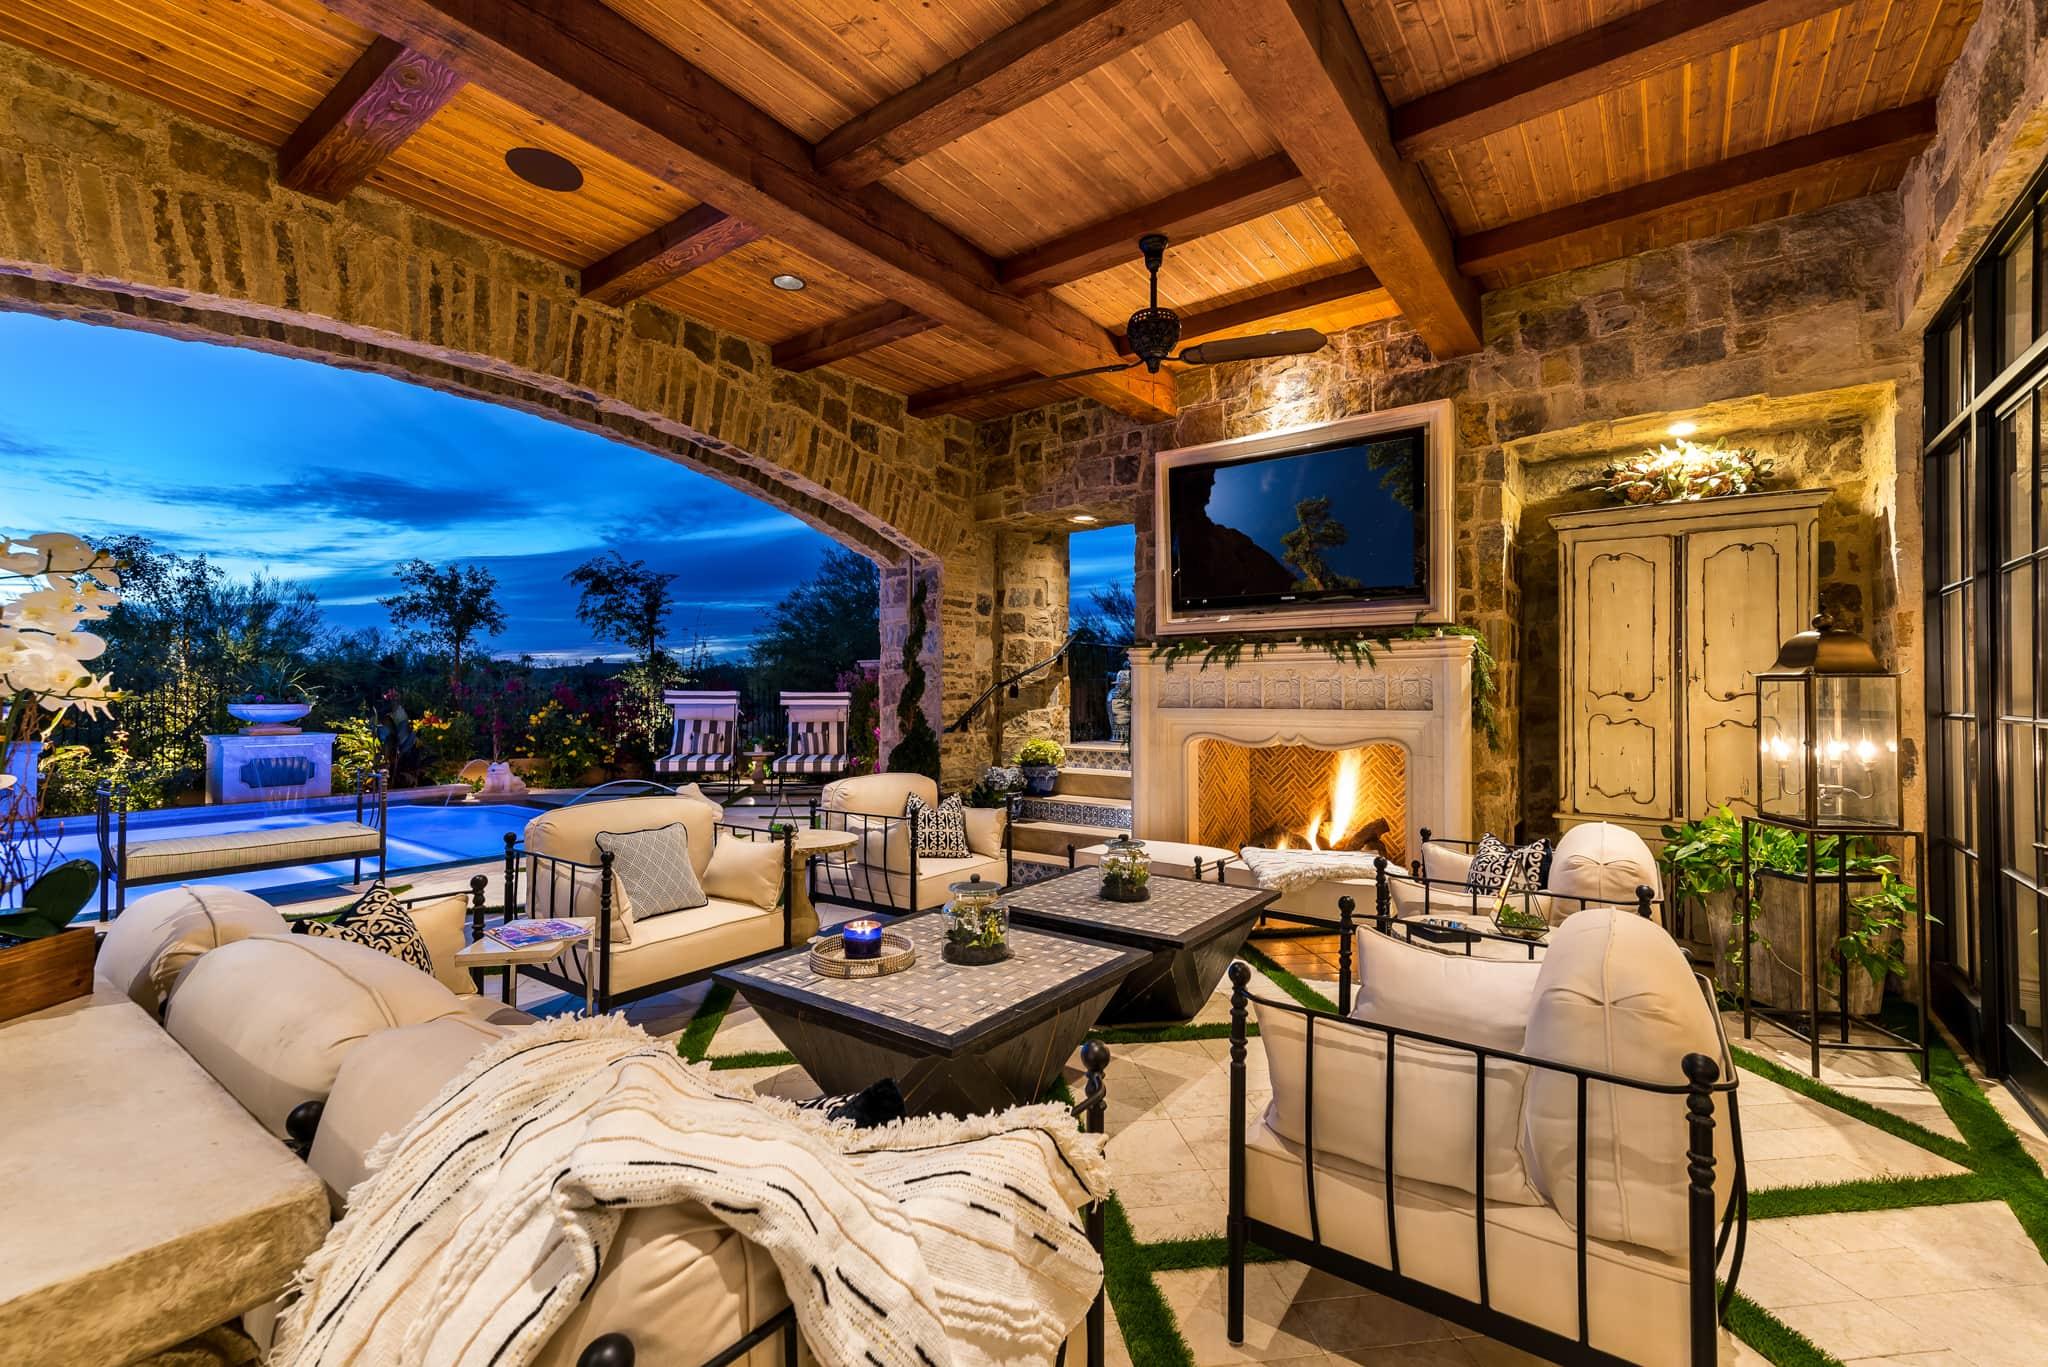 Design a Home for Entertaining